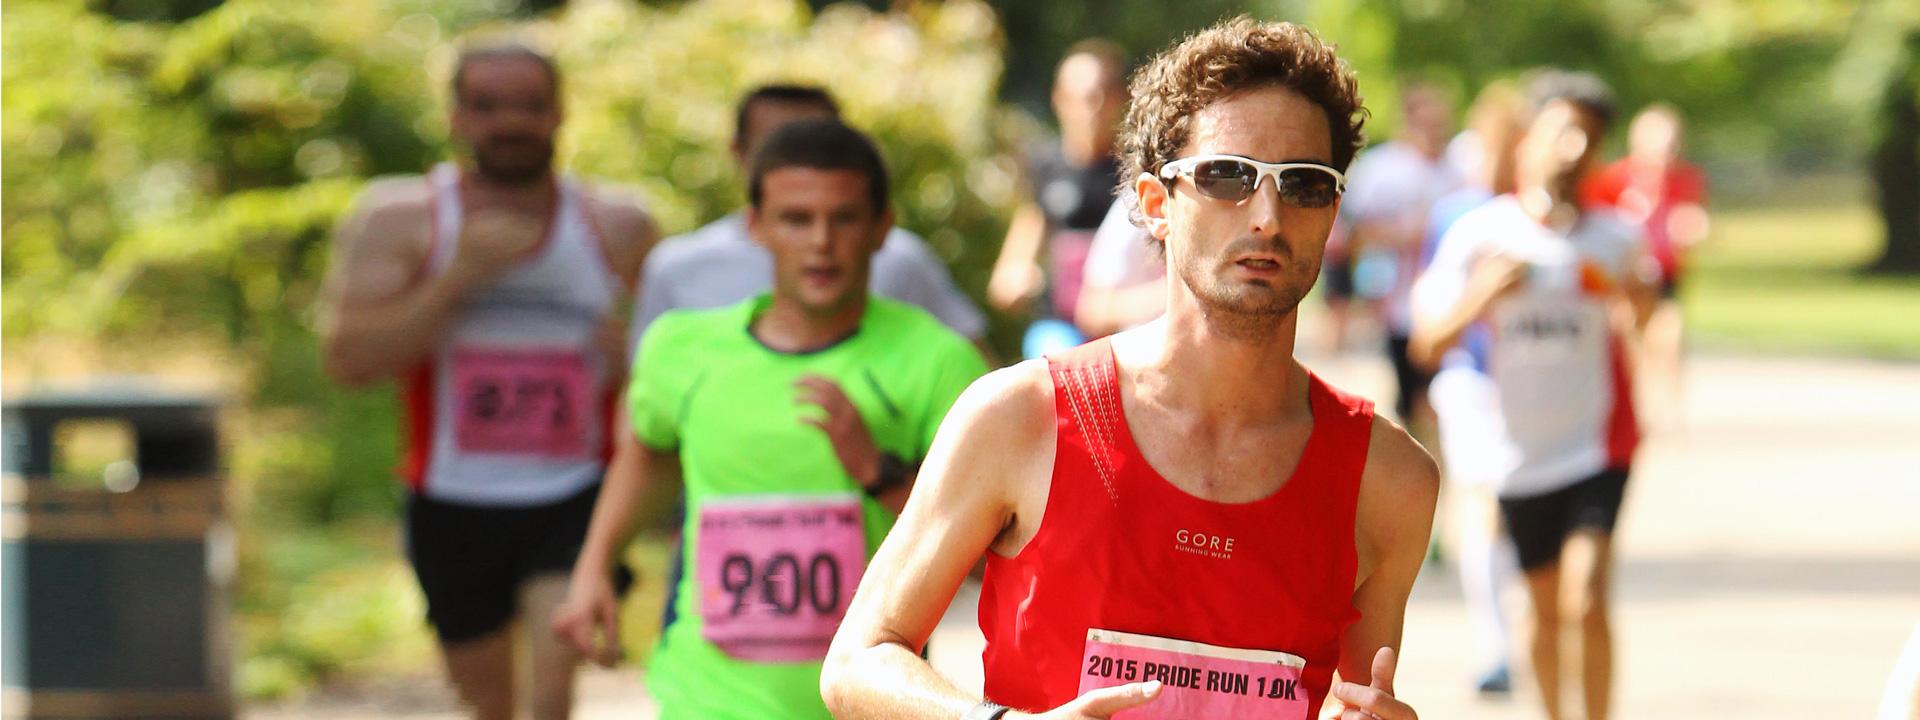 Pride Run 10k 2015